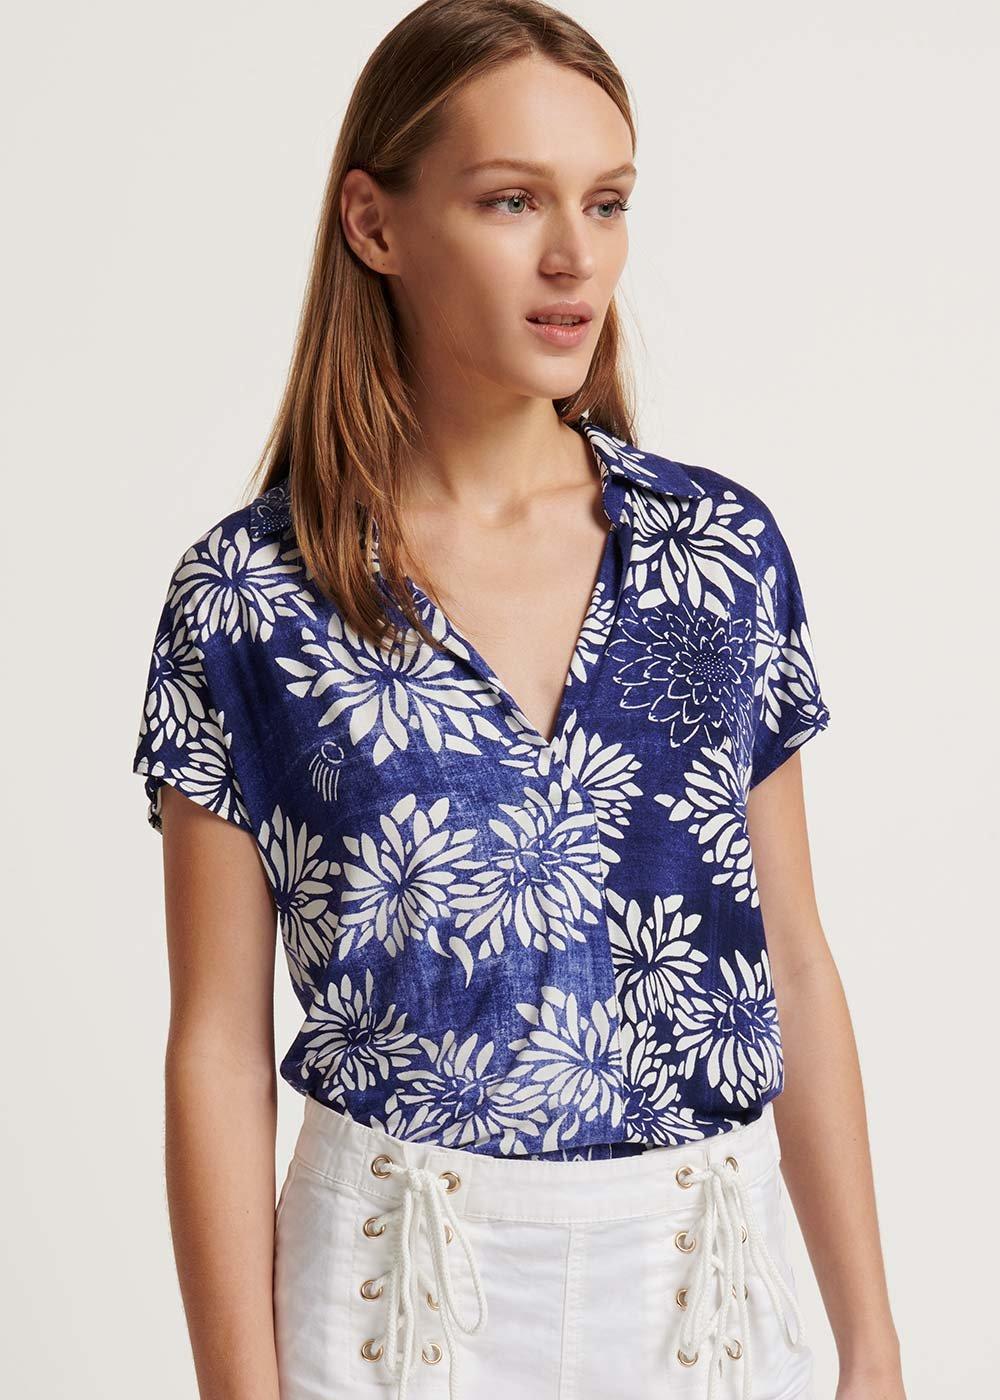 Samelia T-shirt with floral blue pattern - Blu / White / Fantasia - Woman